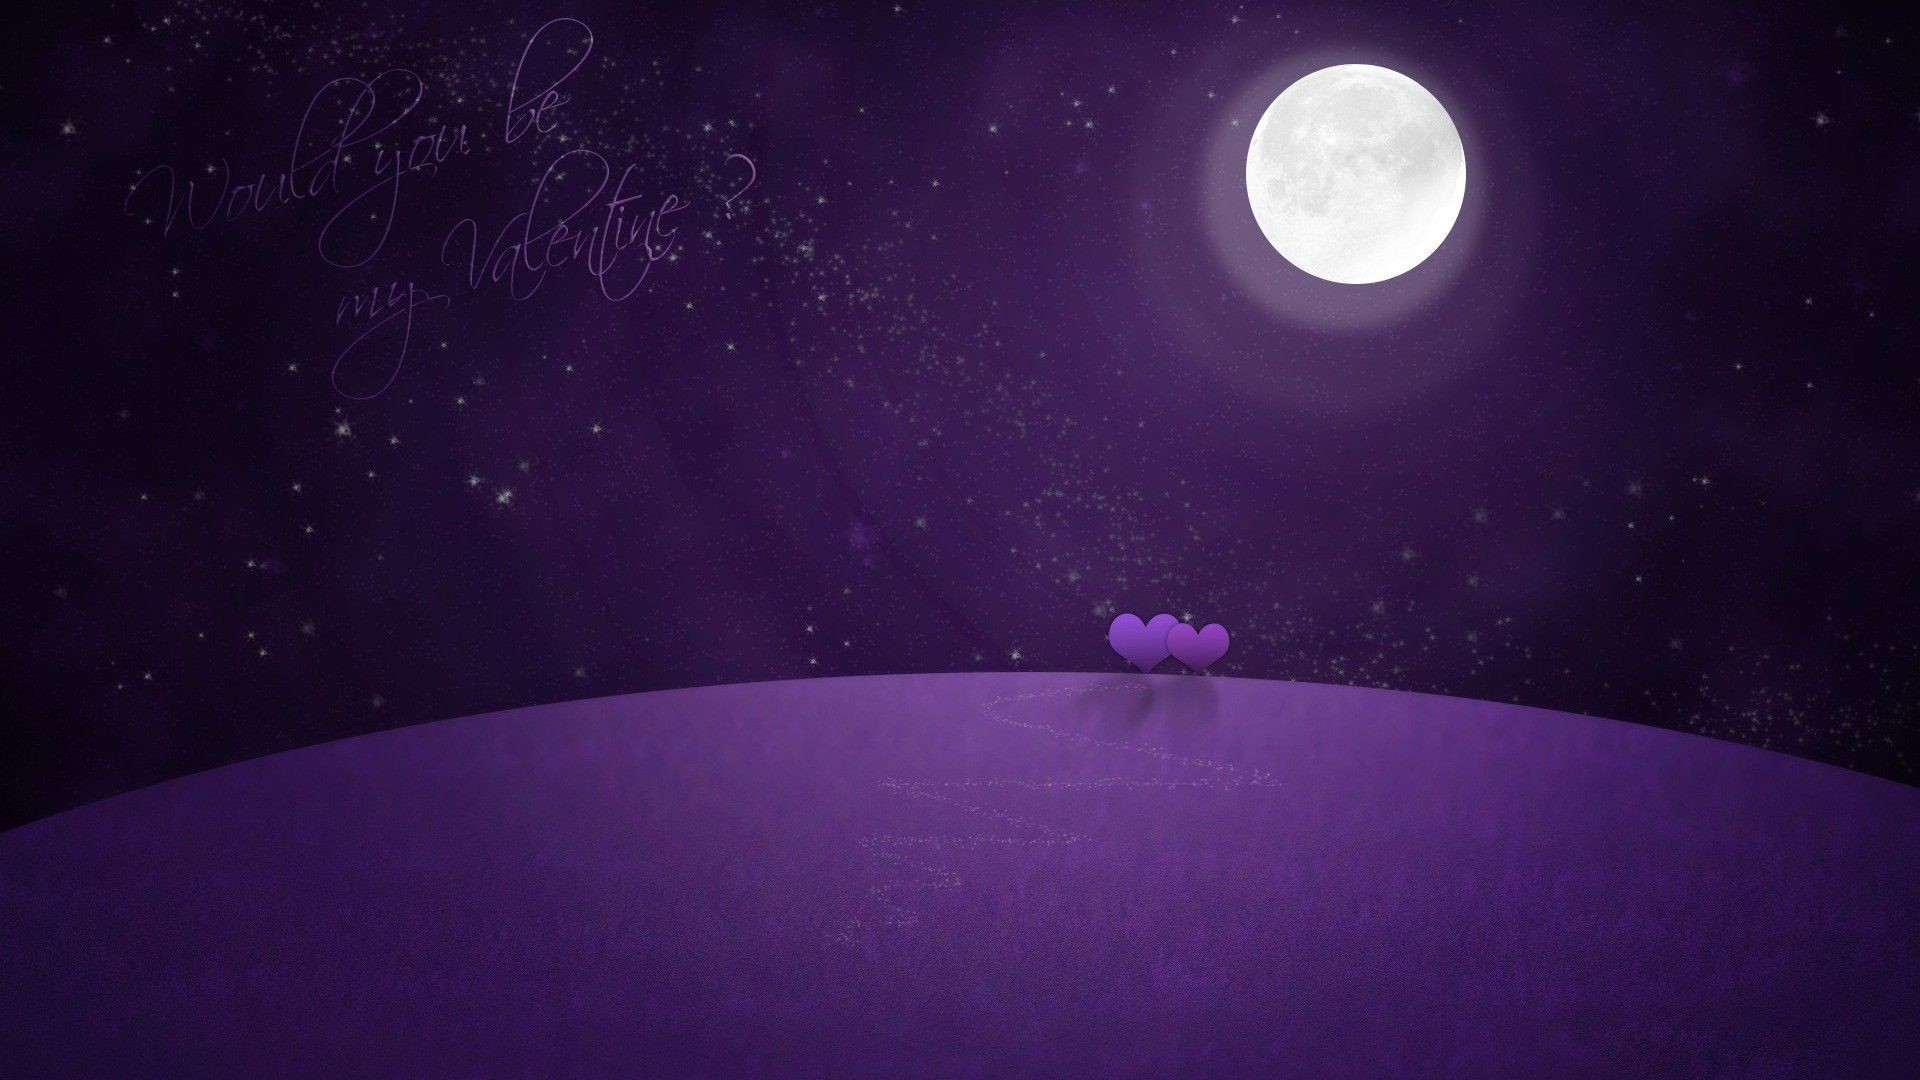 Valentines Day Purple Violet Moon Art Design Background wallpaper .